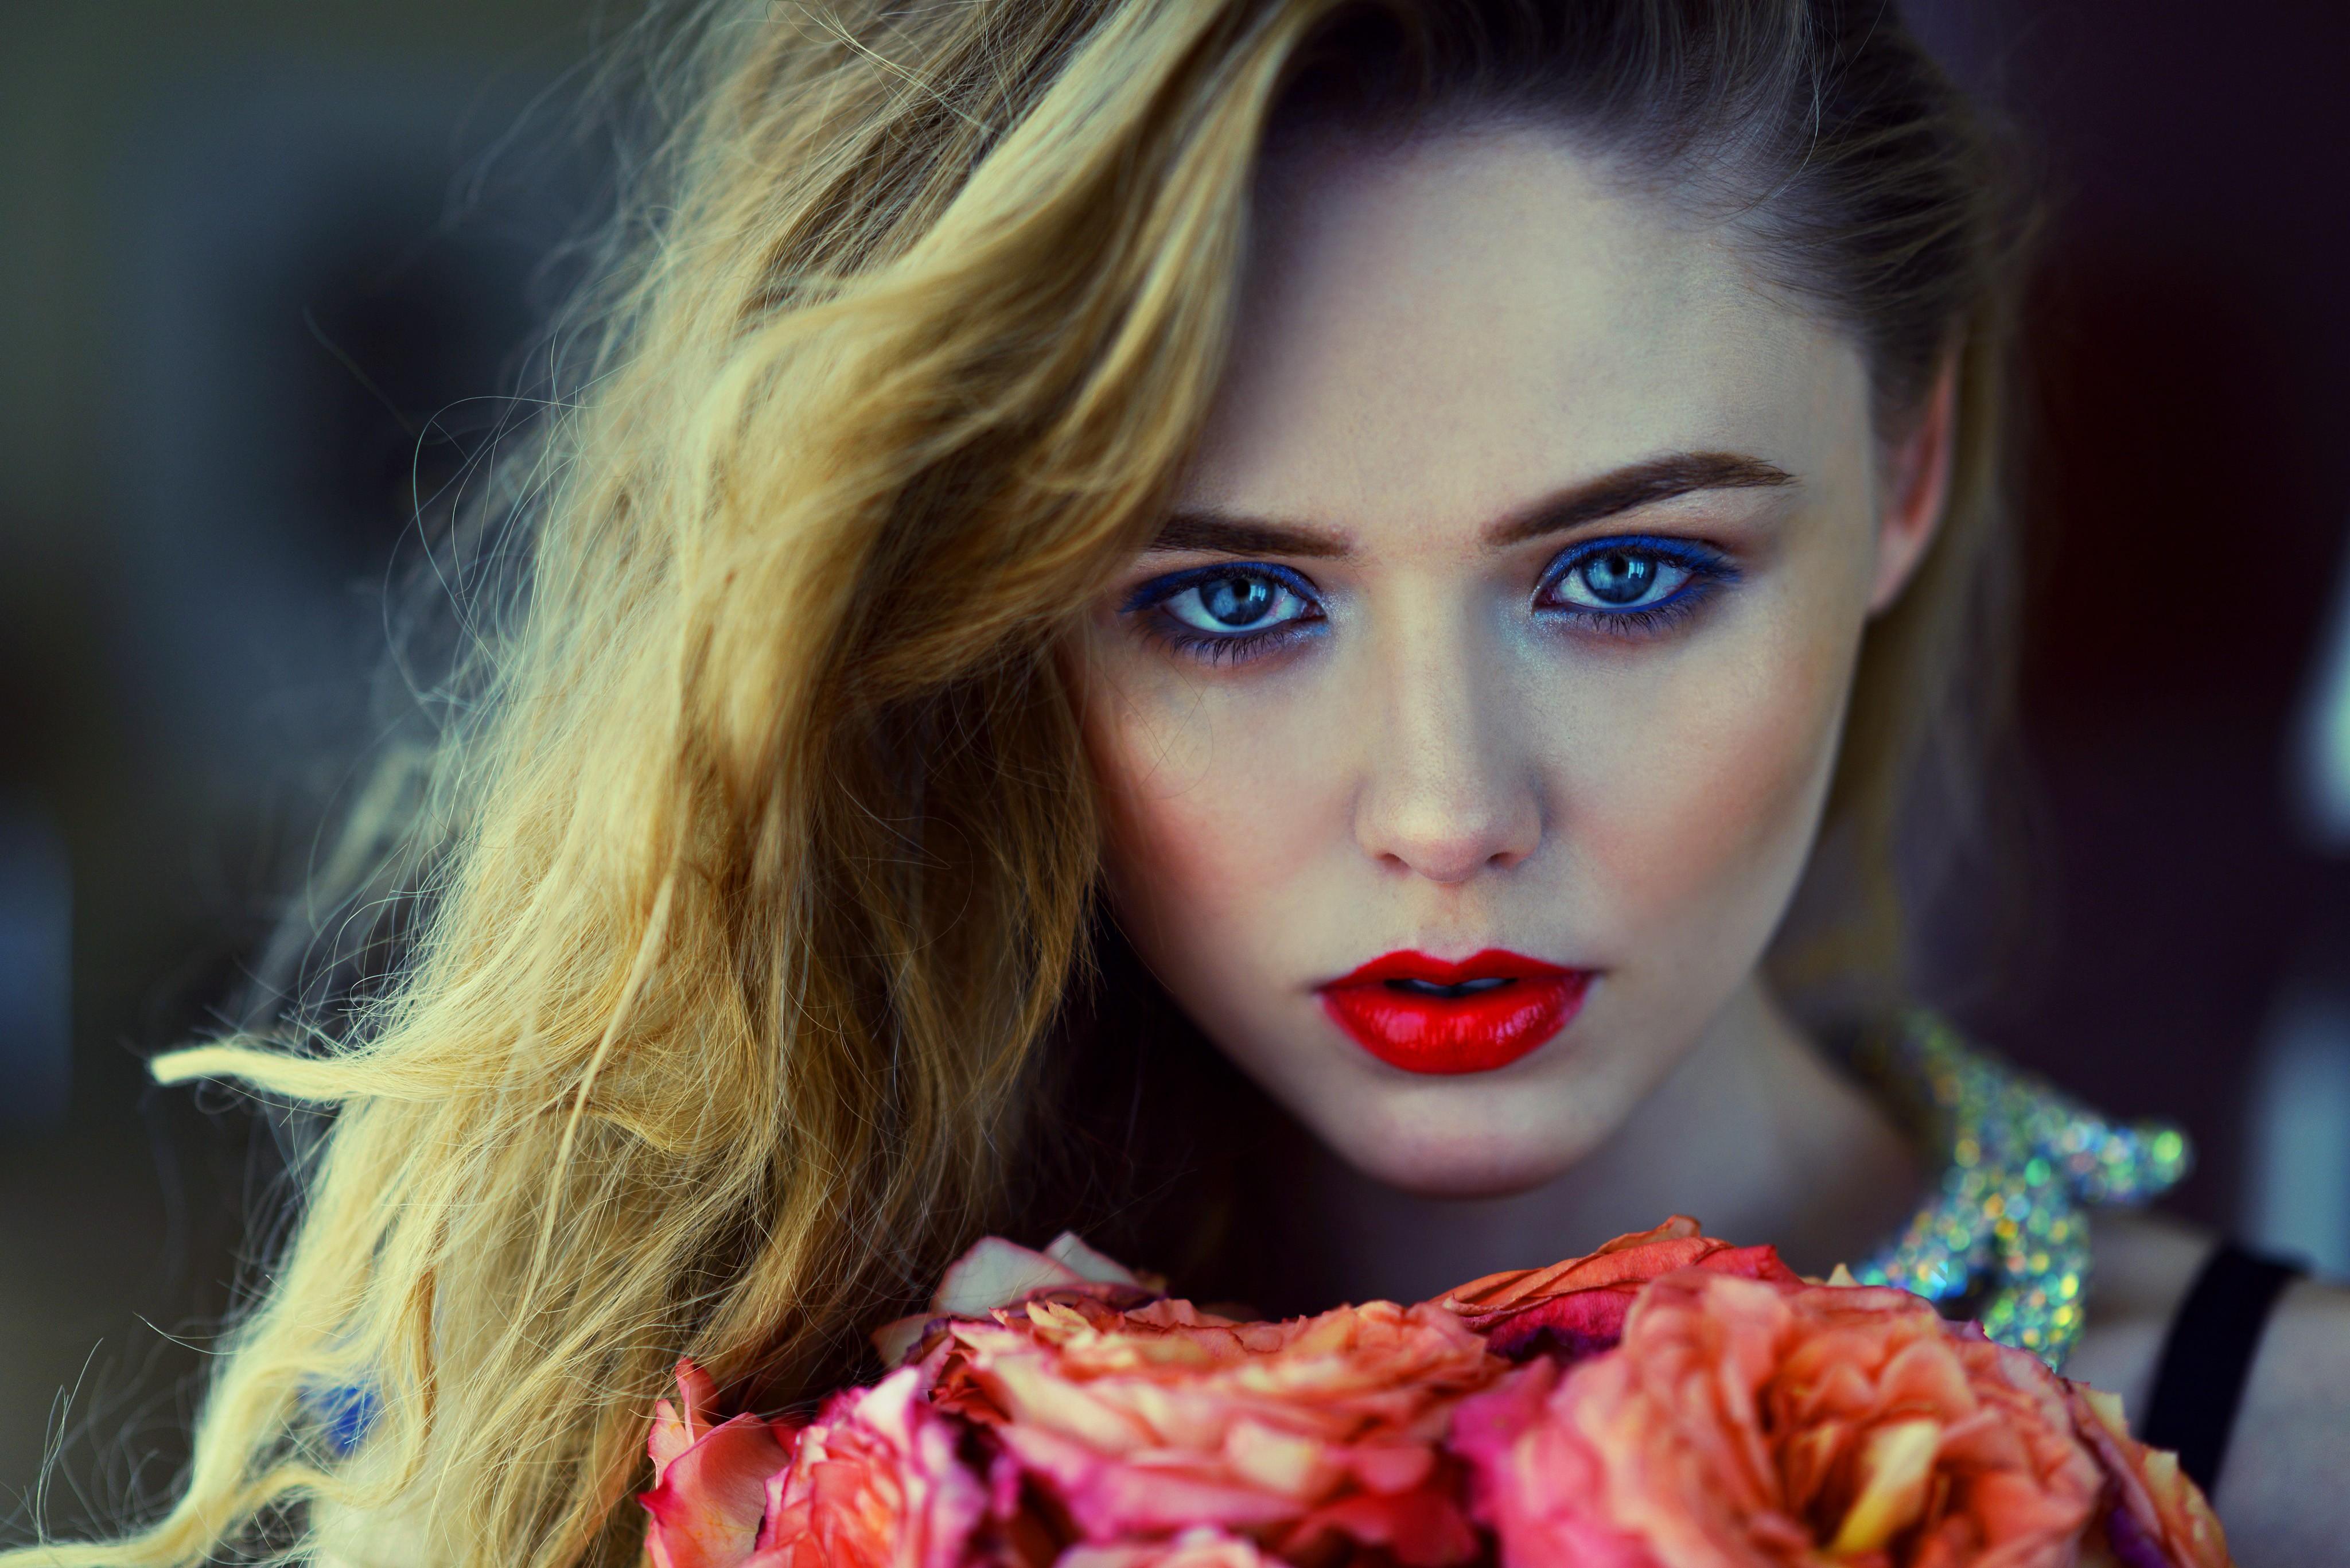 Free Images : girl, woman, flower, portrait, model, spring